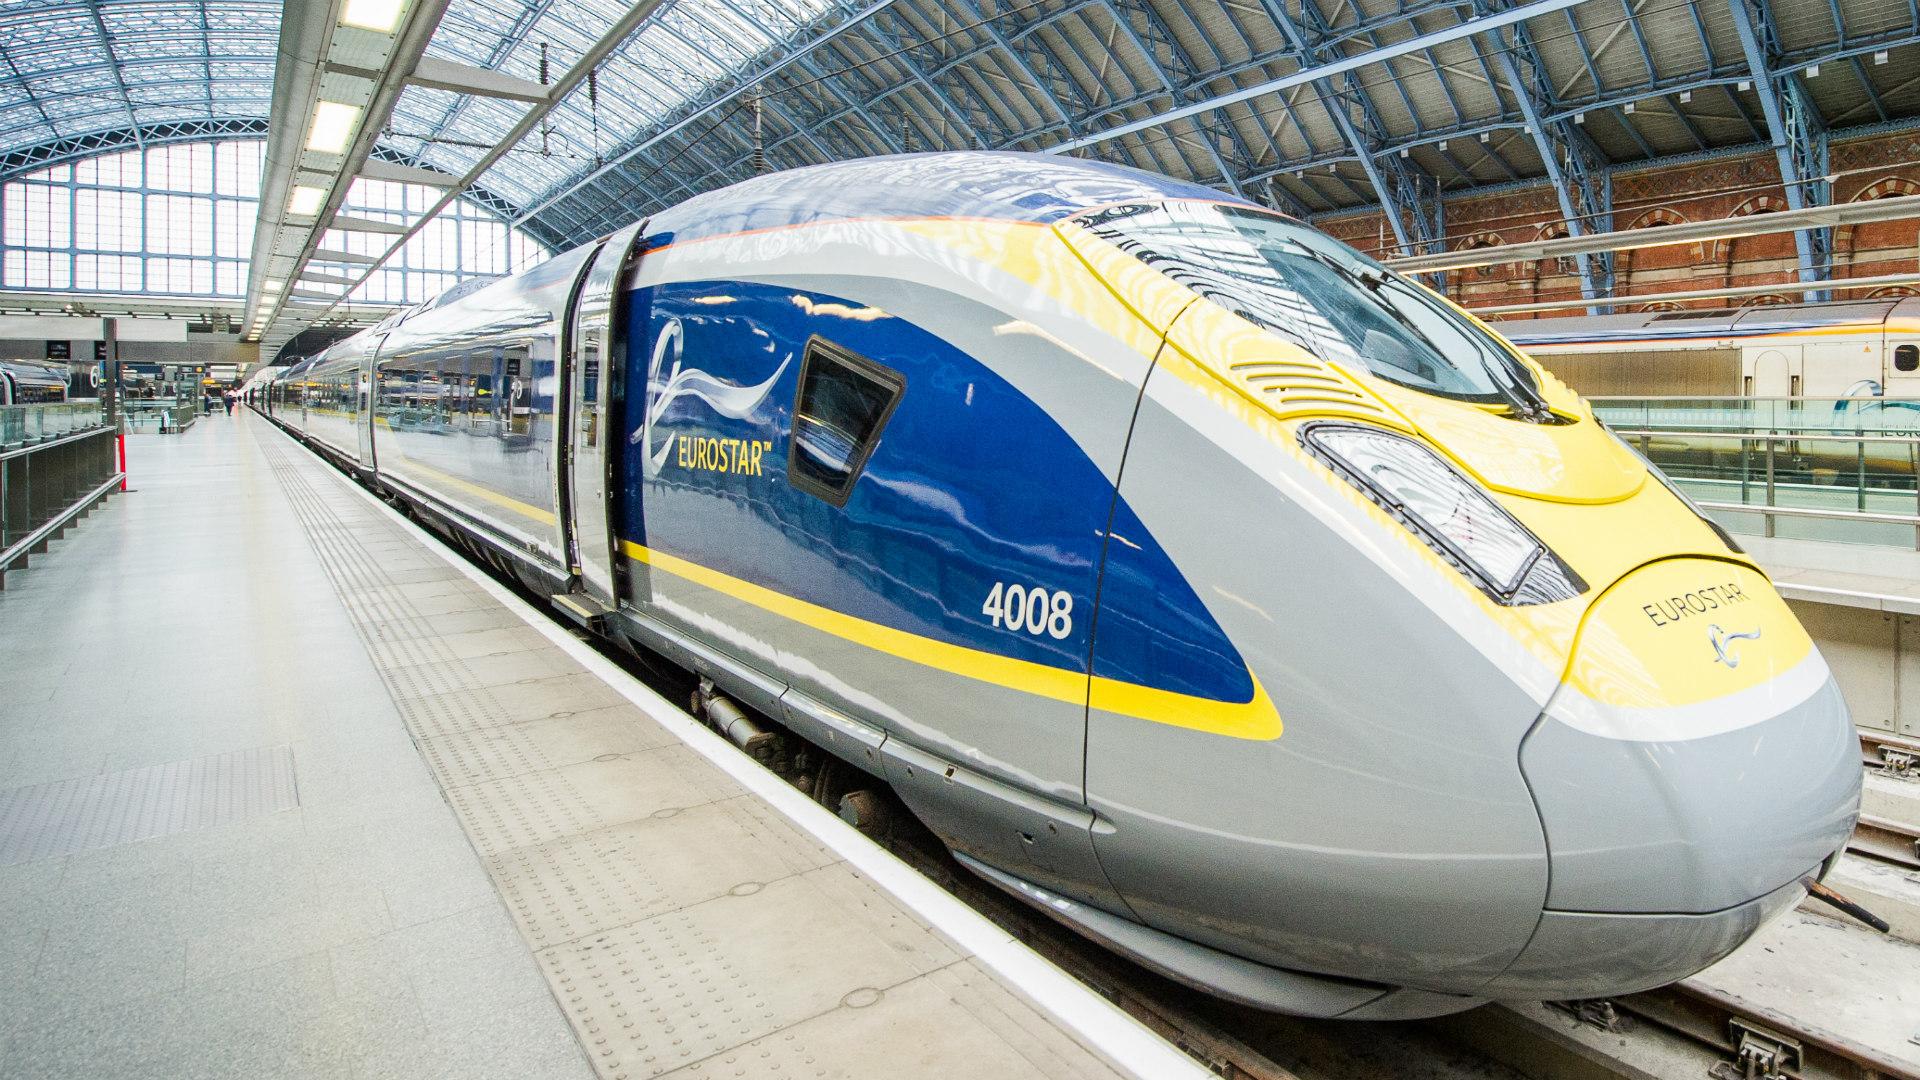 Shermans Travel Eurostar S New London To Amsterdam